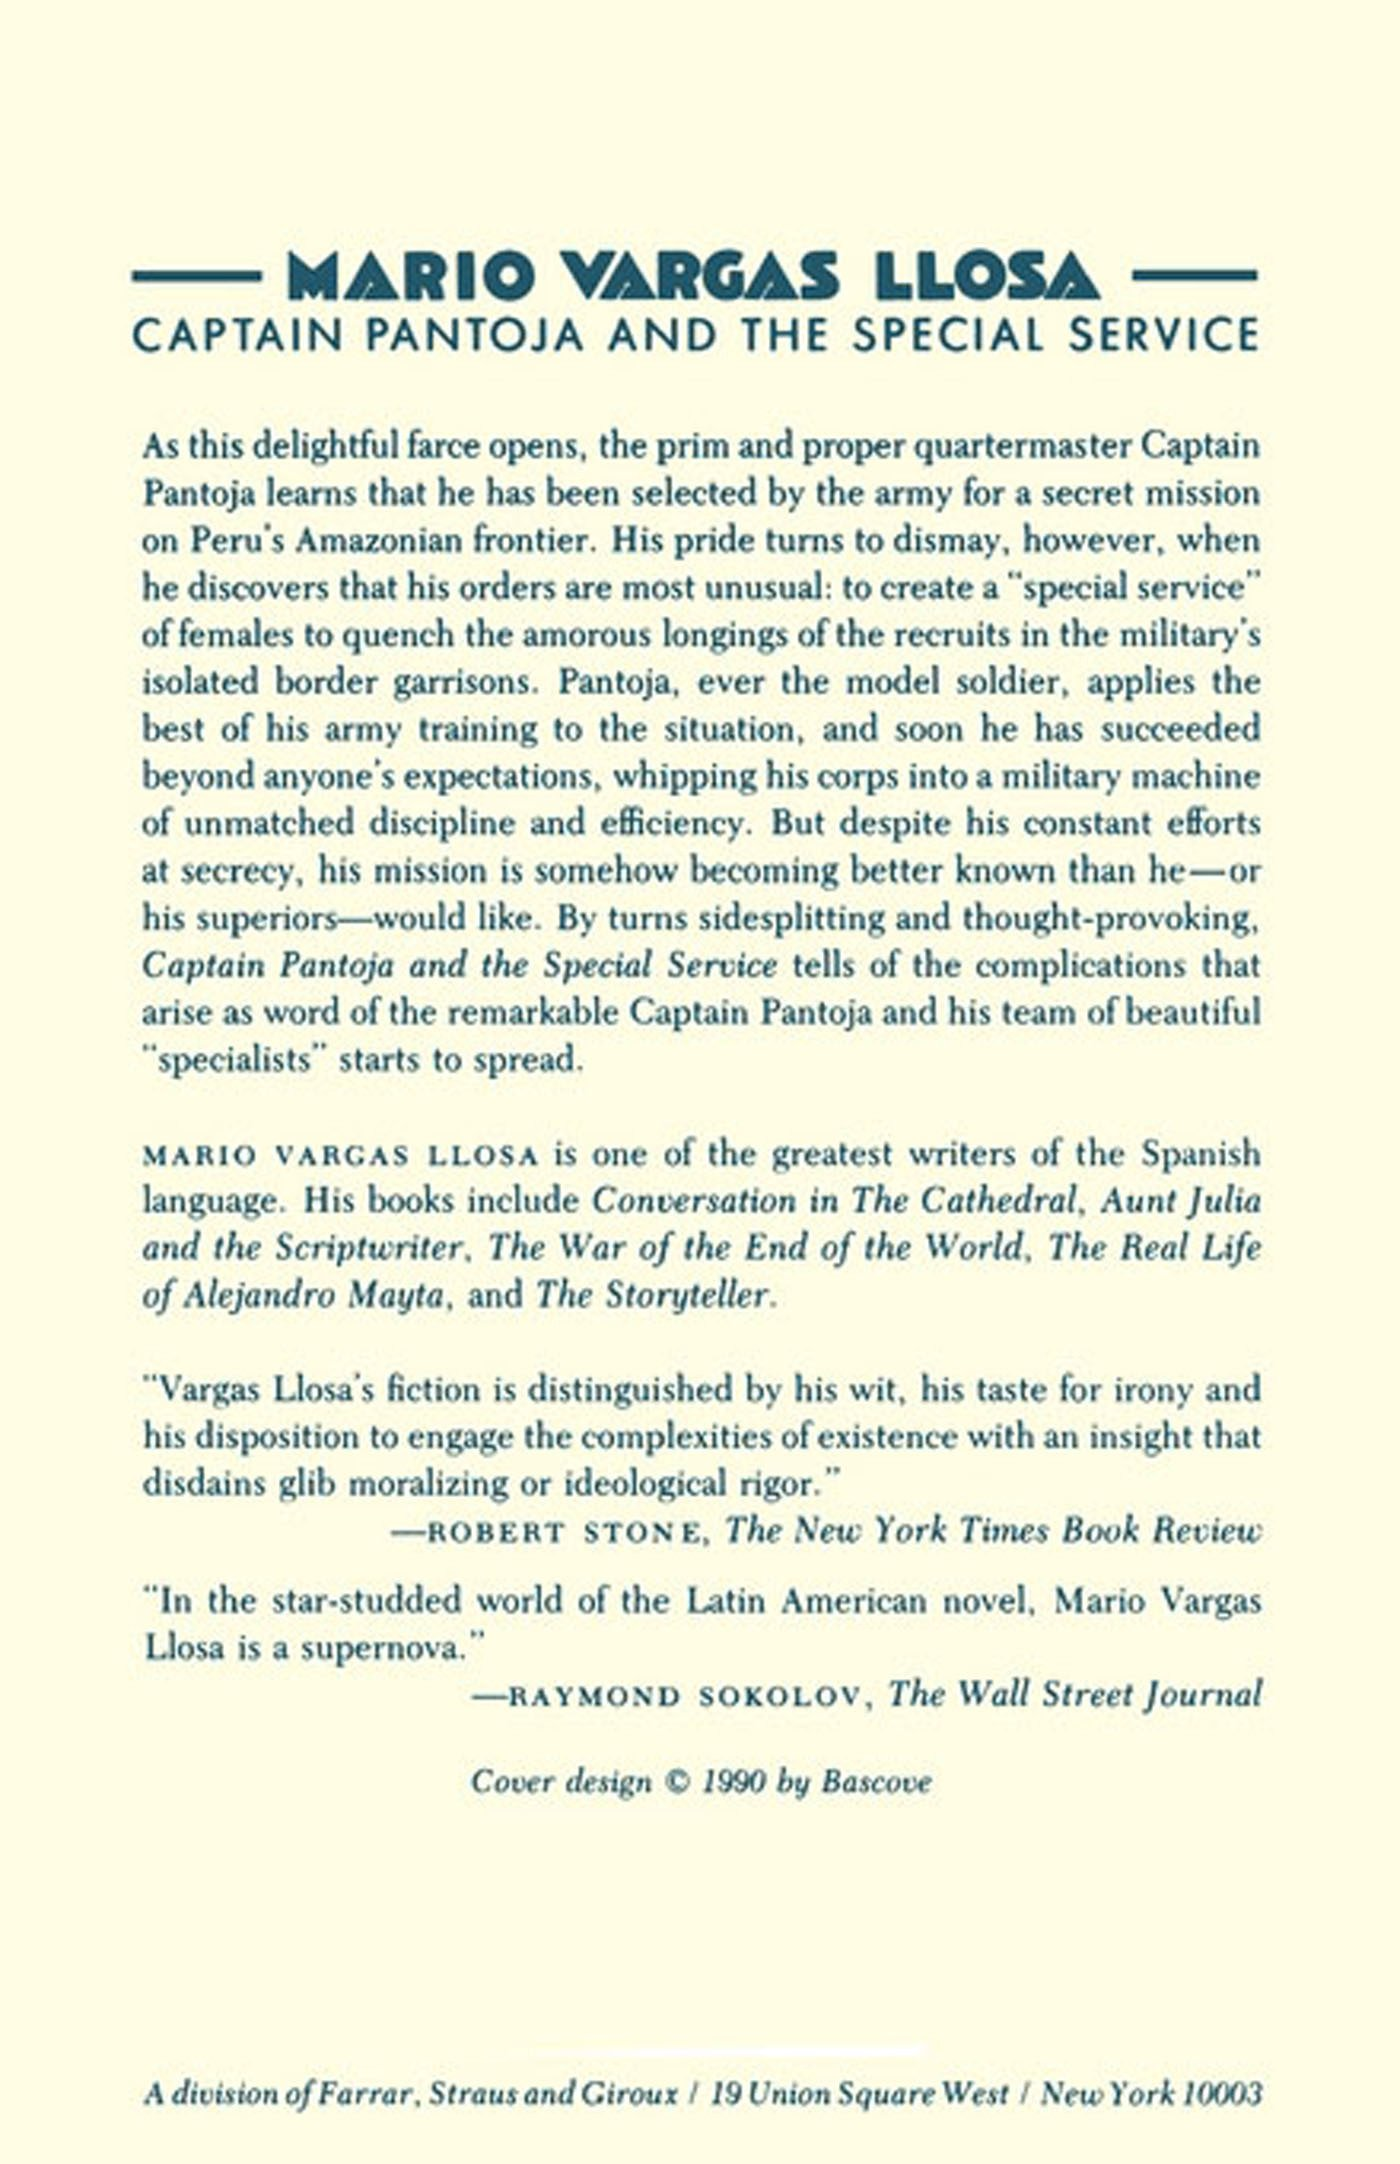 Captain Pantoja And The Special Service: A Novel: Mario Vargas Llosa,  Gregory Kolovakos, Ronald Christ: 9780374522360: Amazon: Books